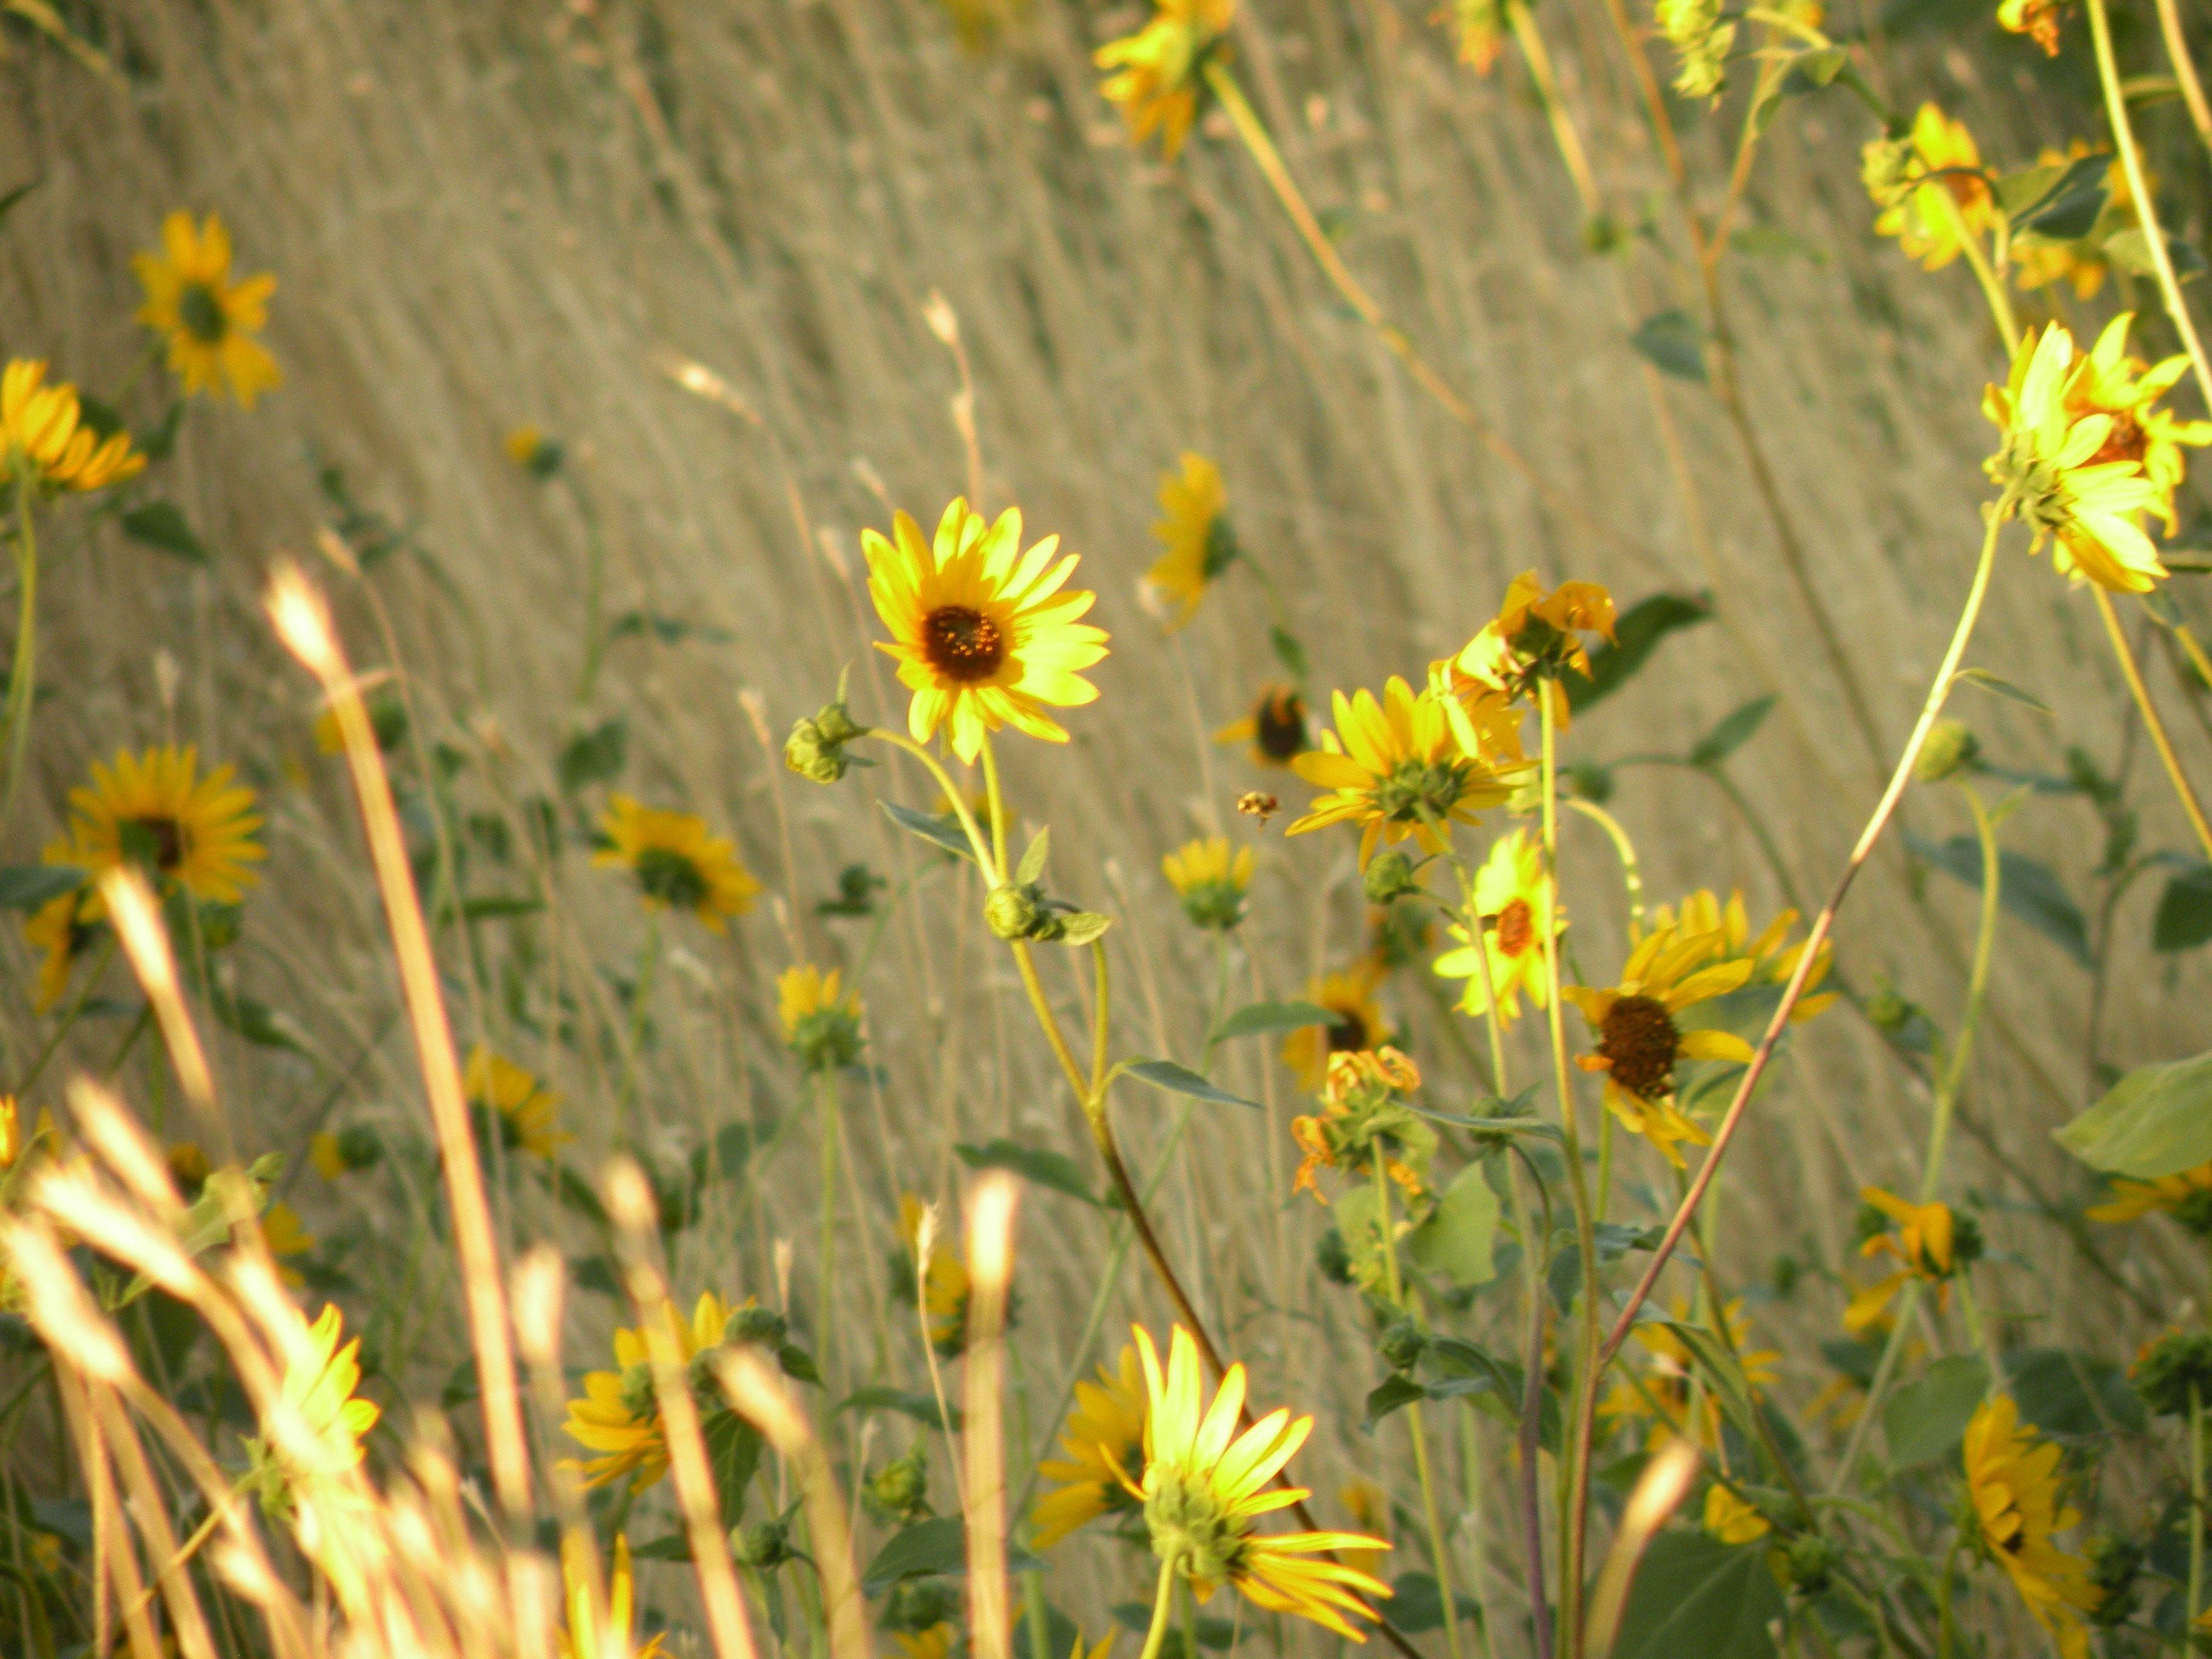 Sunflowers in Field Near Oquirrh Mountain Temple